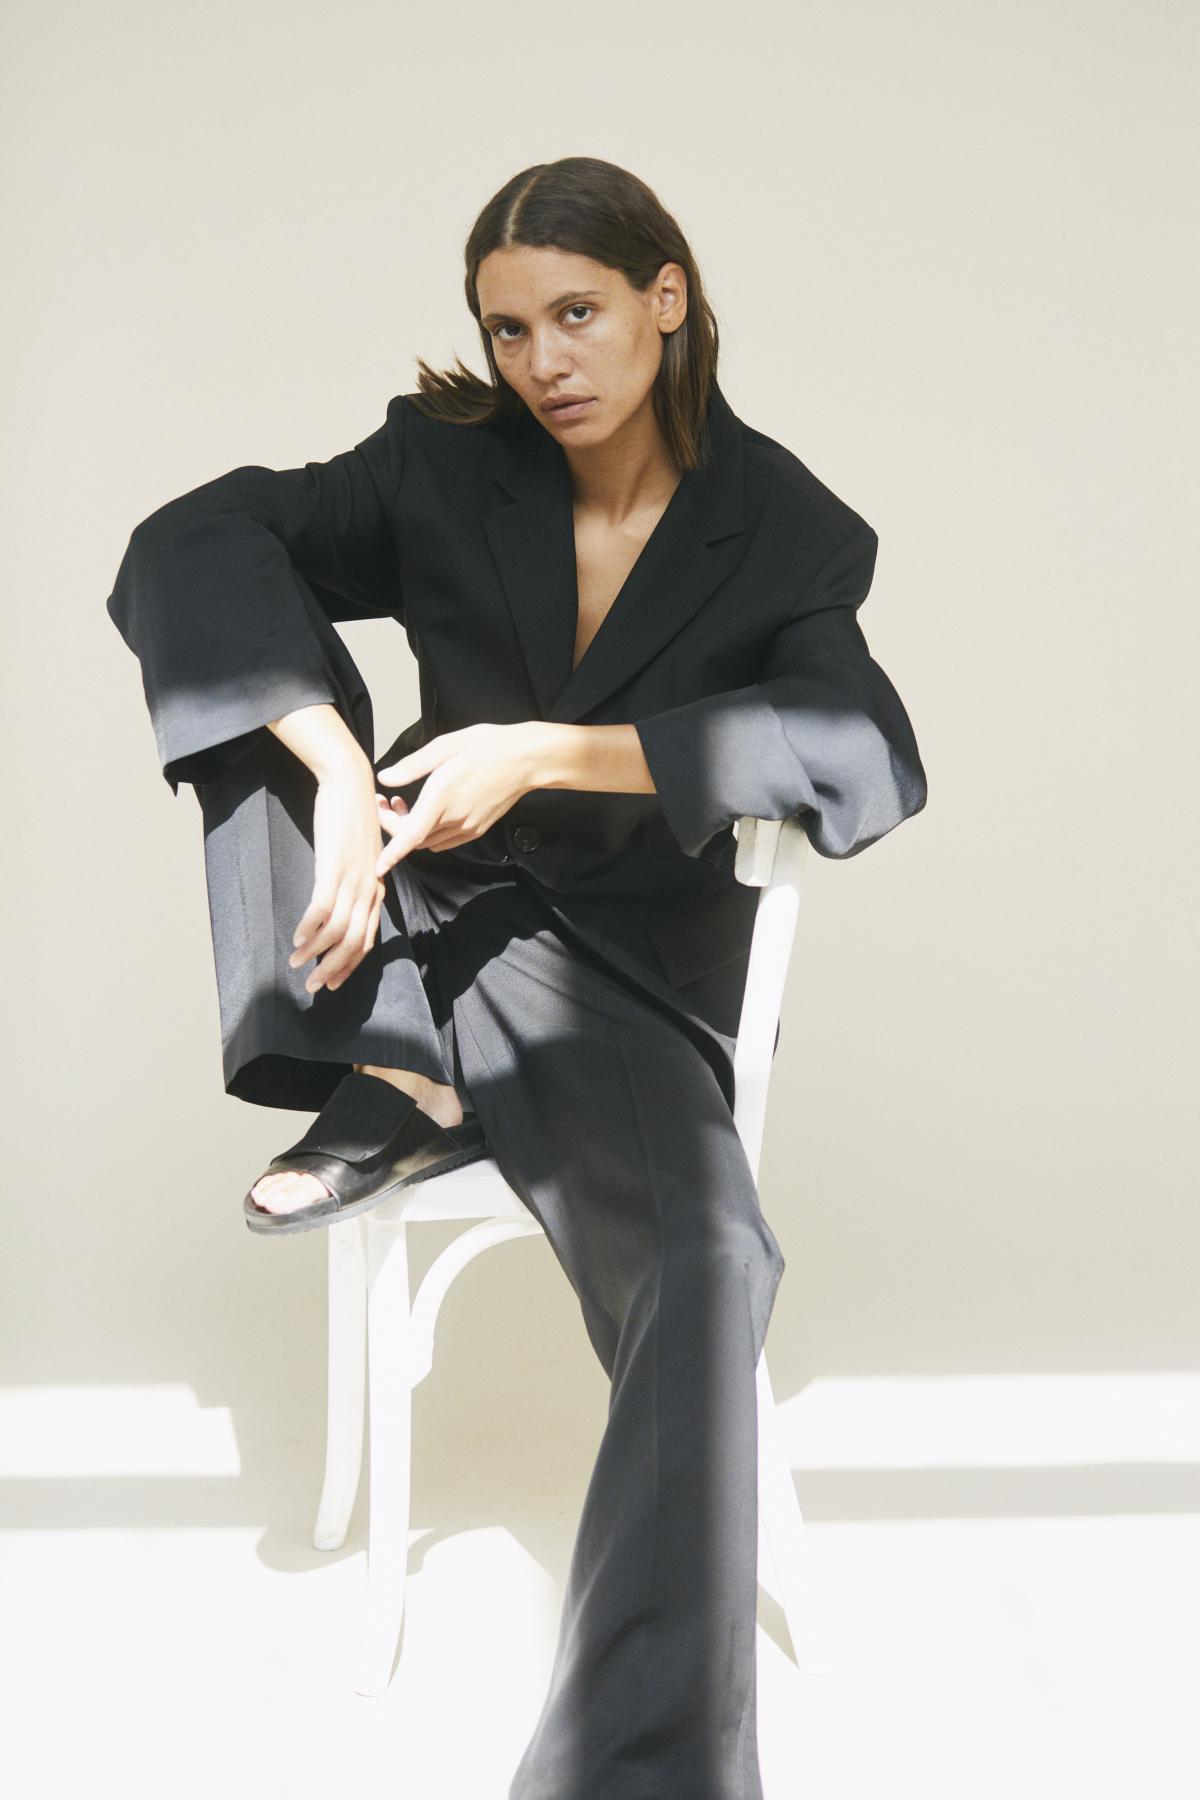 Jacket SALLY, Trousers STEFANIE